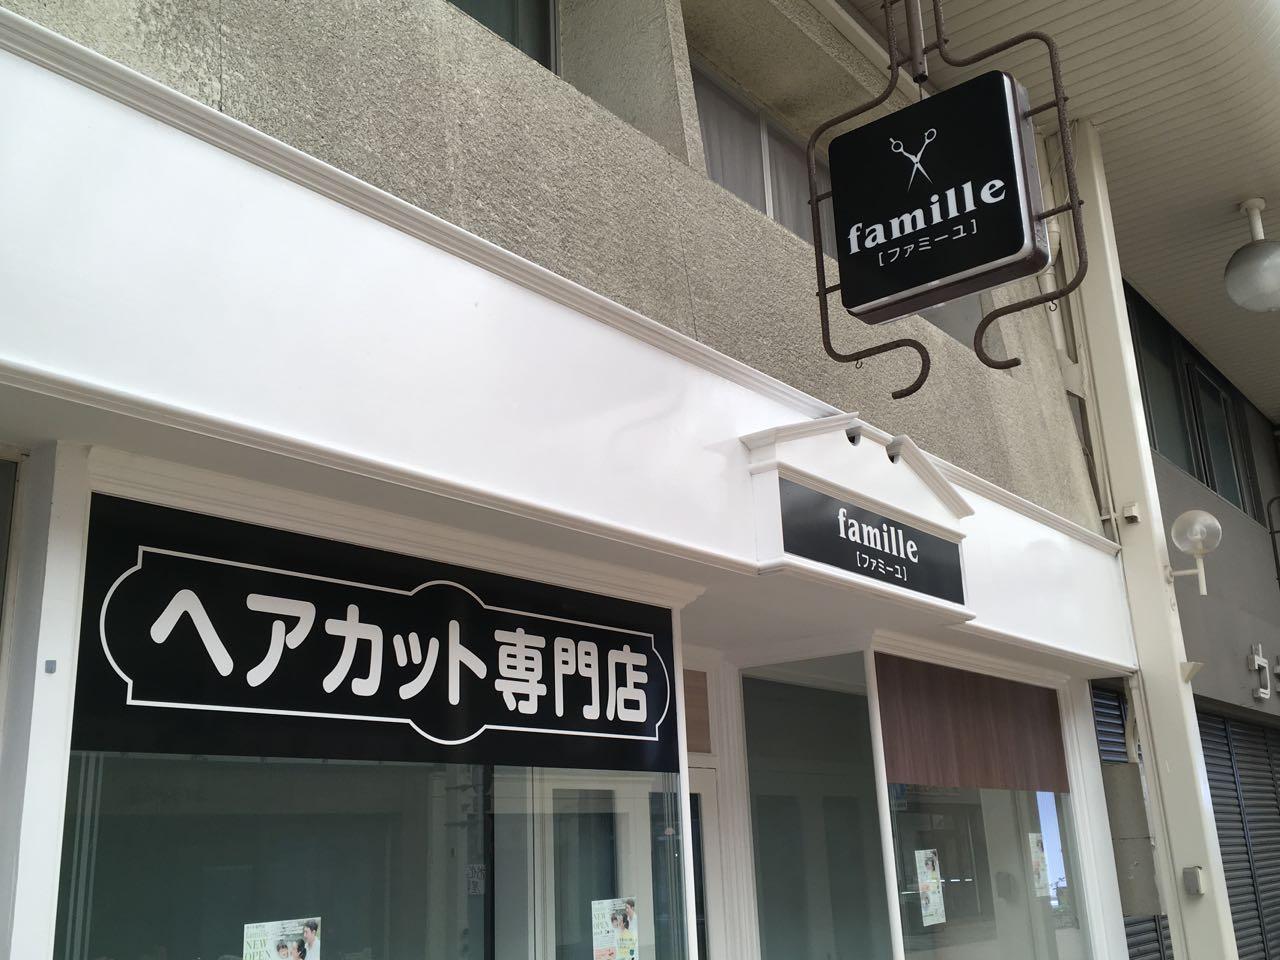 ehime,famille,imabari,みとん今治,カット専門店,ファミーユ,今治,愛媛,美容室